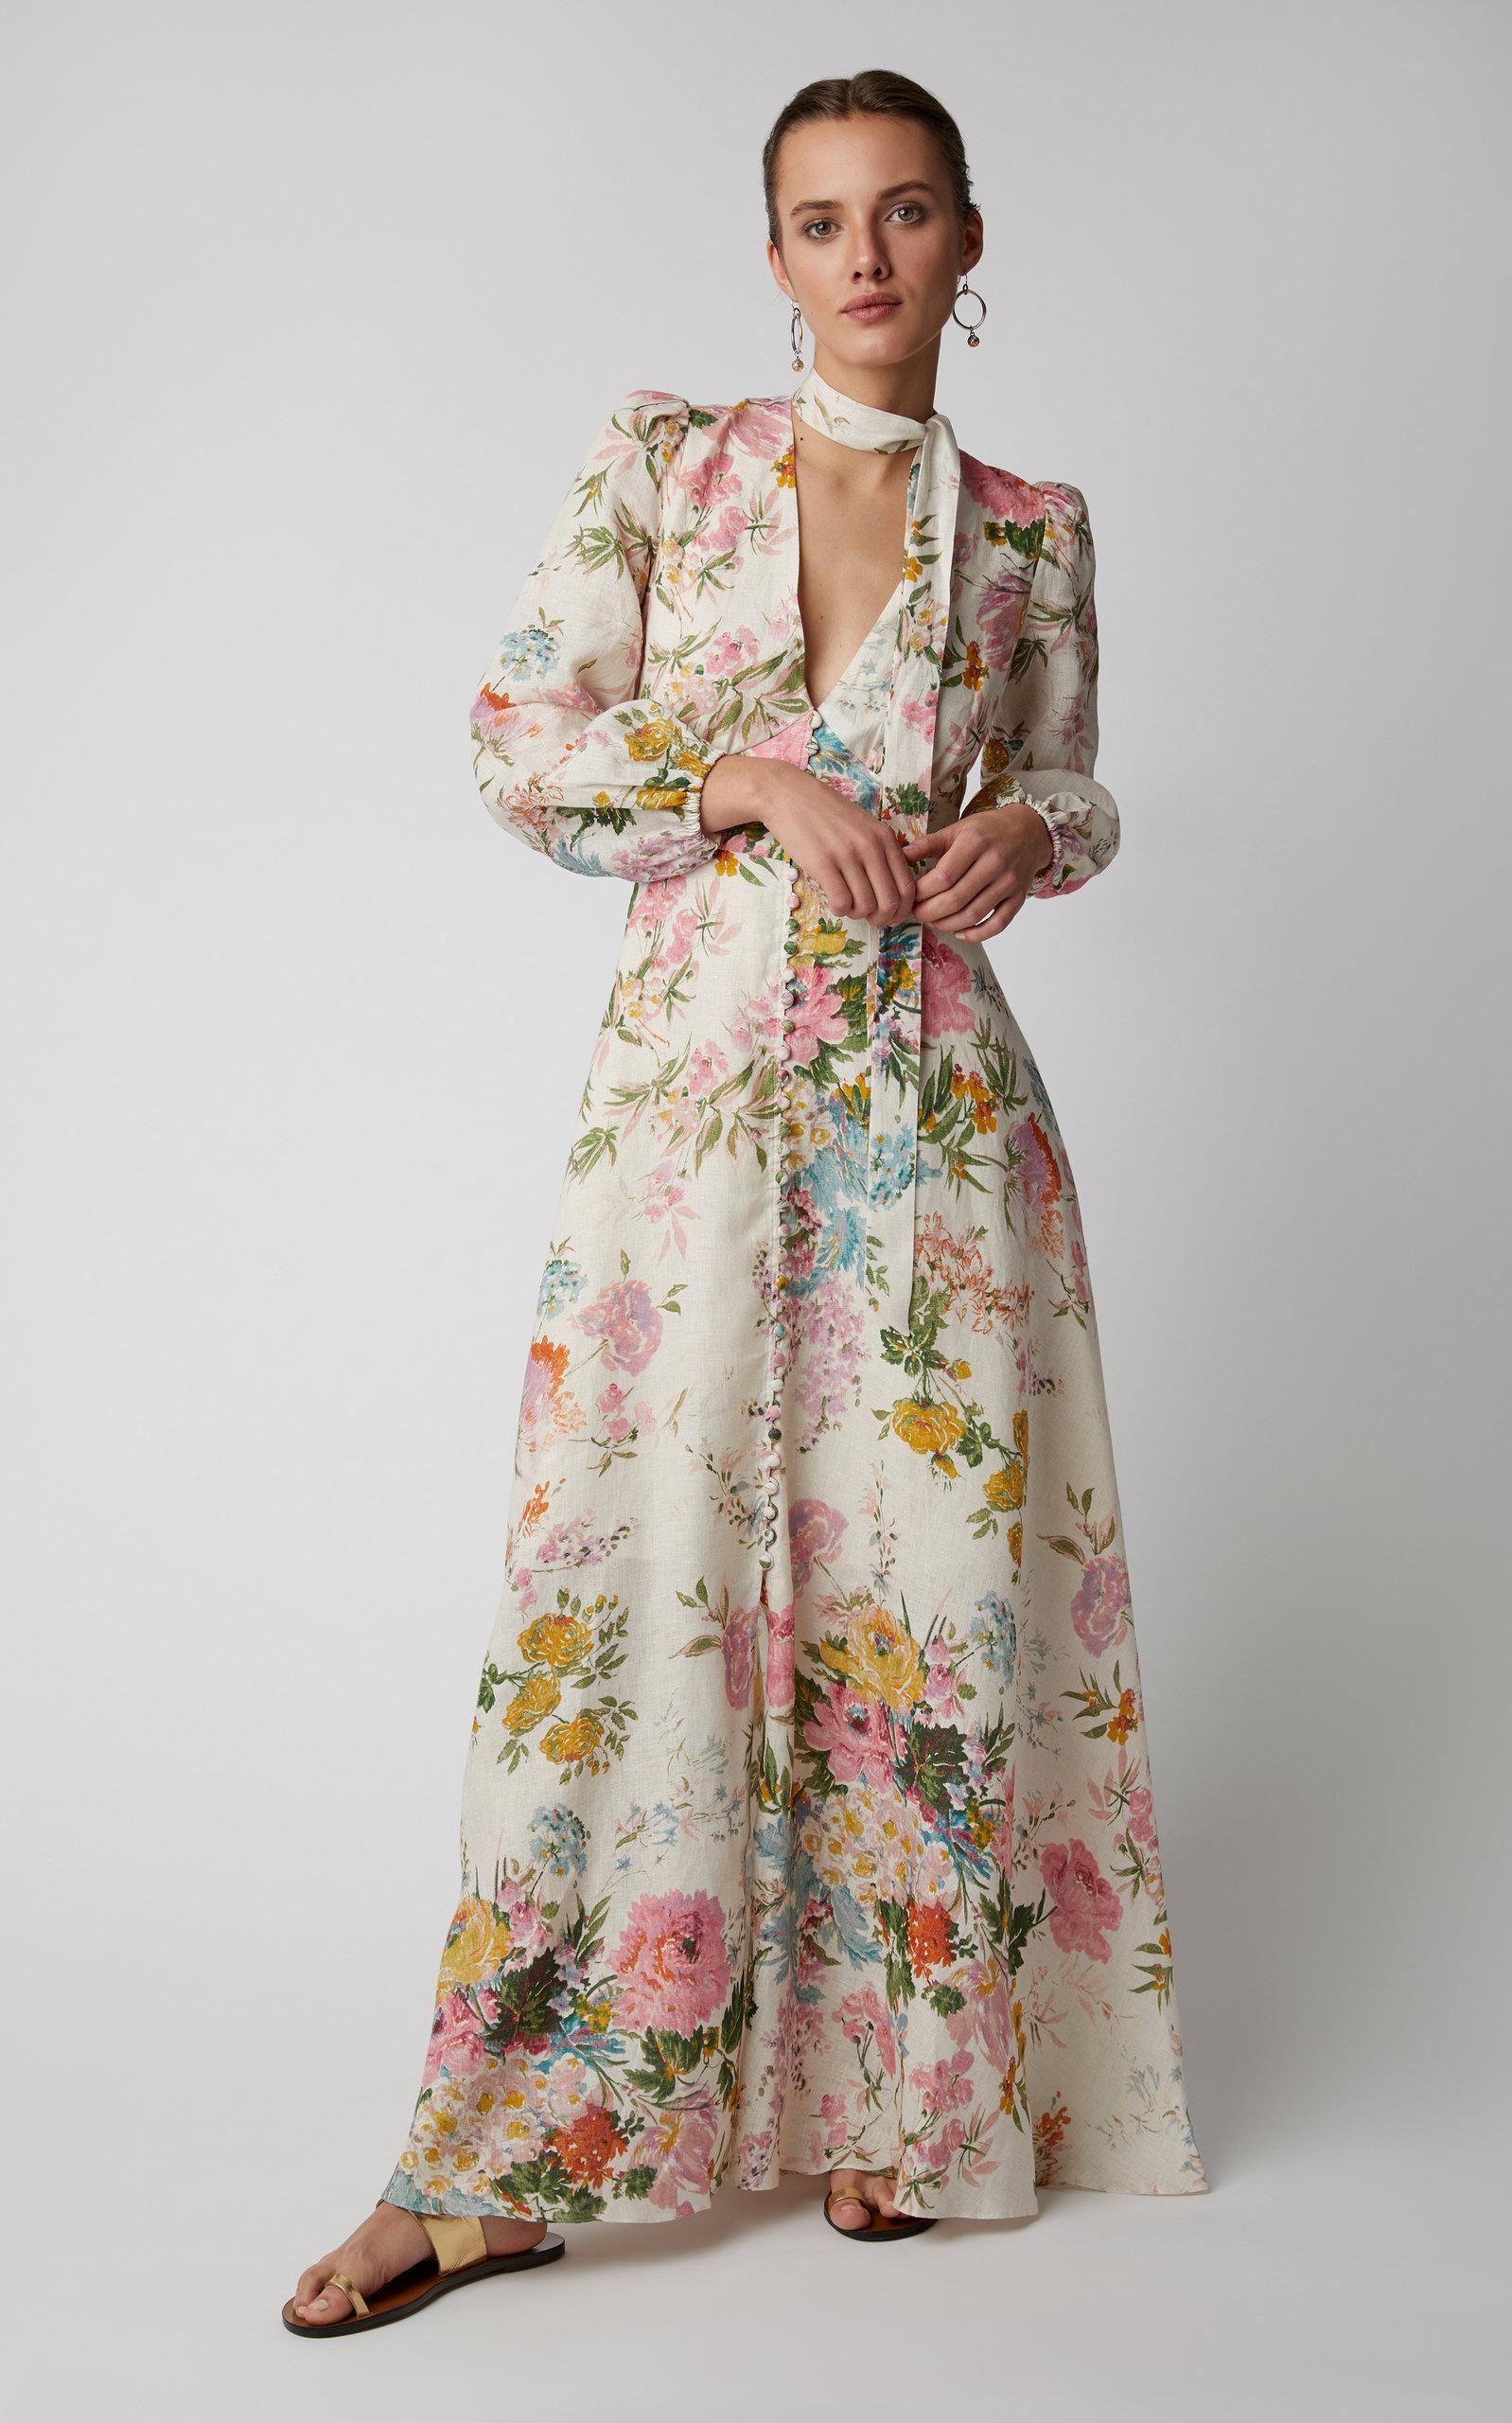 53570557d7 Zimmermann - Multicolor Heathers Floral Linen Maxi Dress - Lyst. View  fullscreen